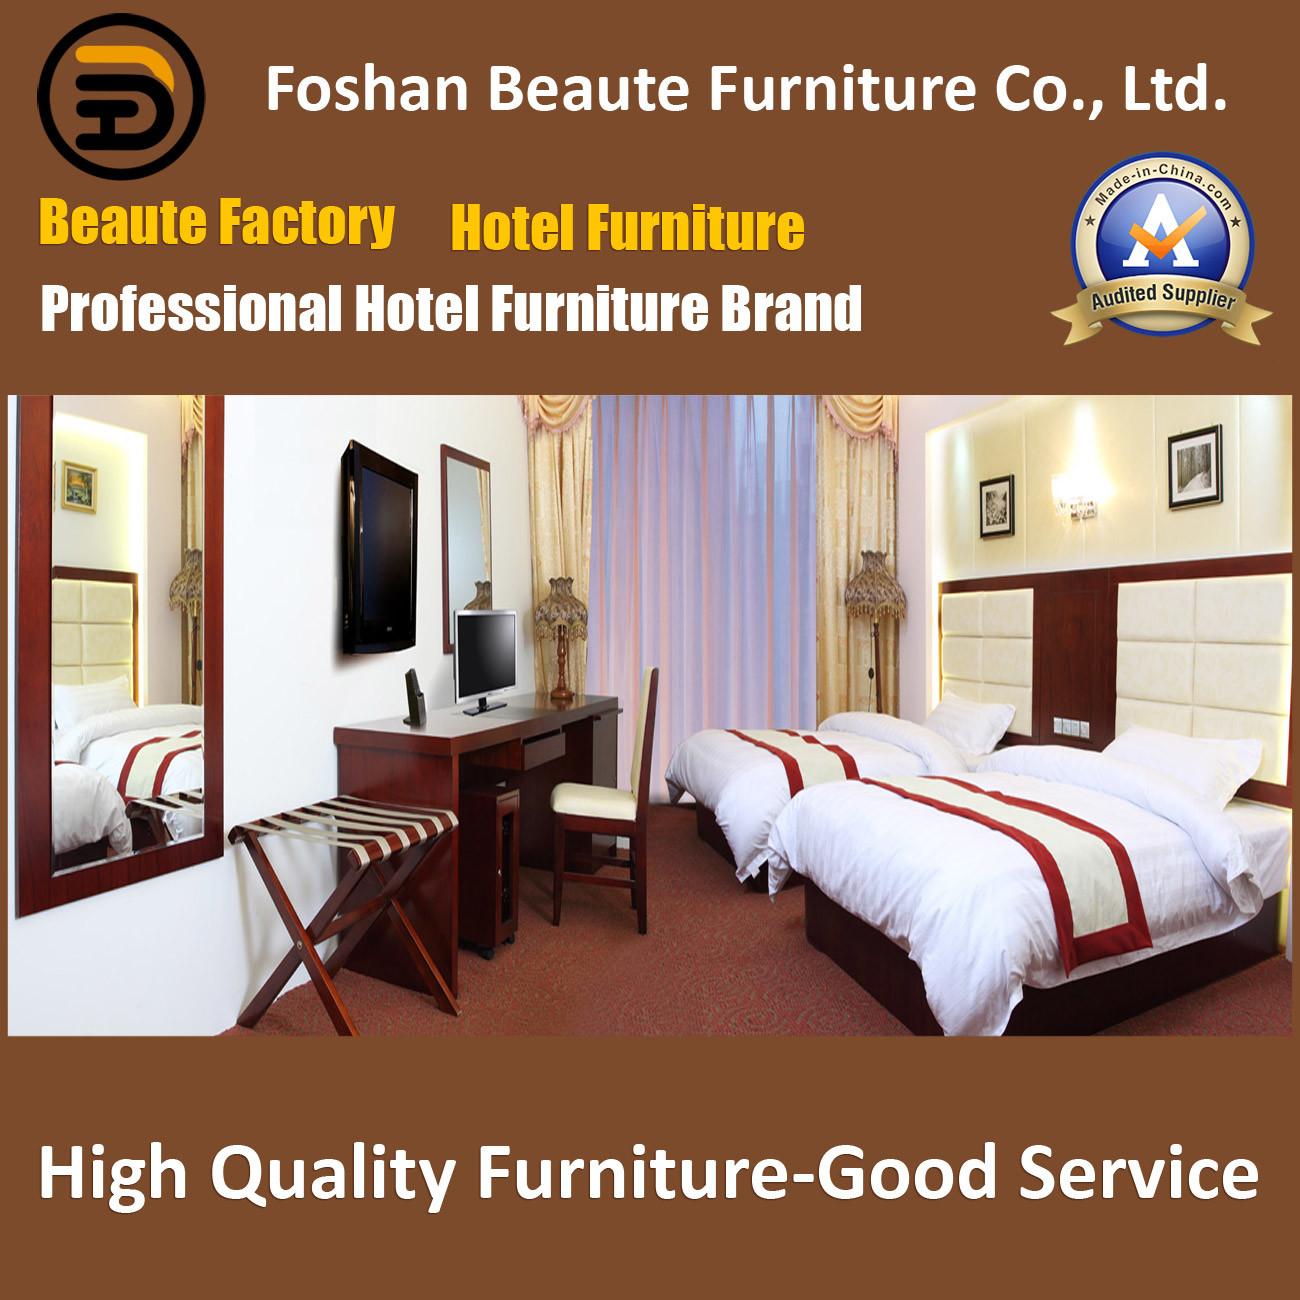 Hotel Furniture/Luxury Double Bedroom Furniture/Standard Hotel Double Bedroom Suite/Double Hospitality Guest Room Furniture (GLB-0109856)